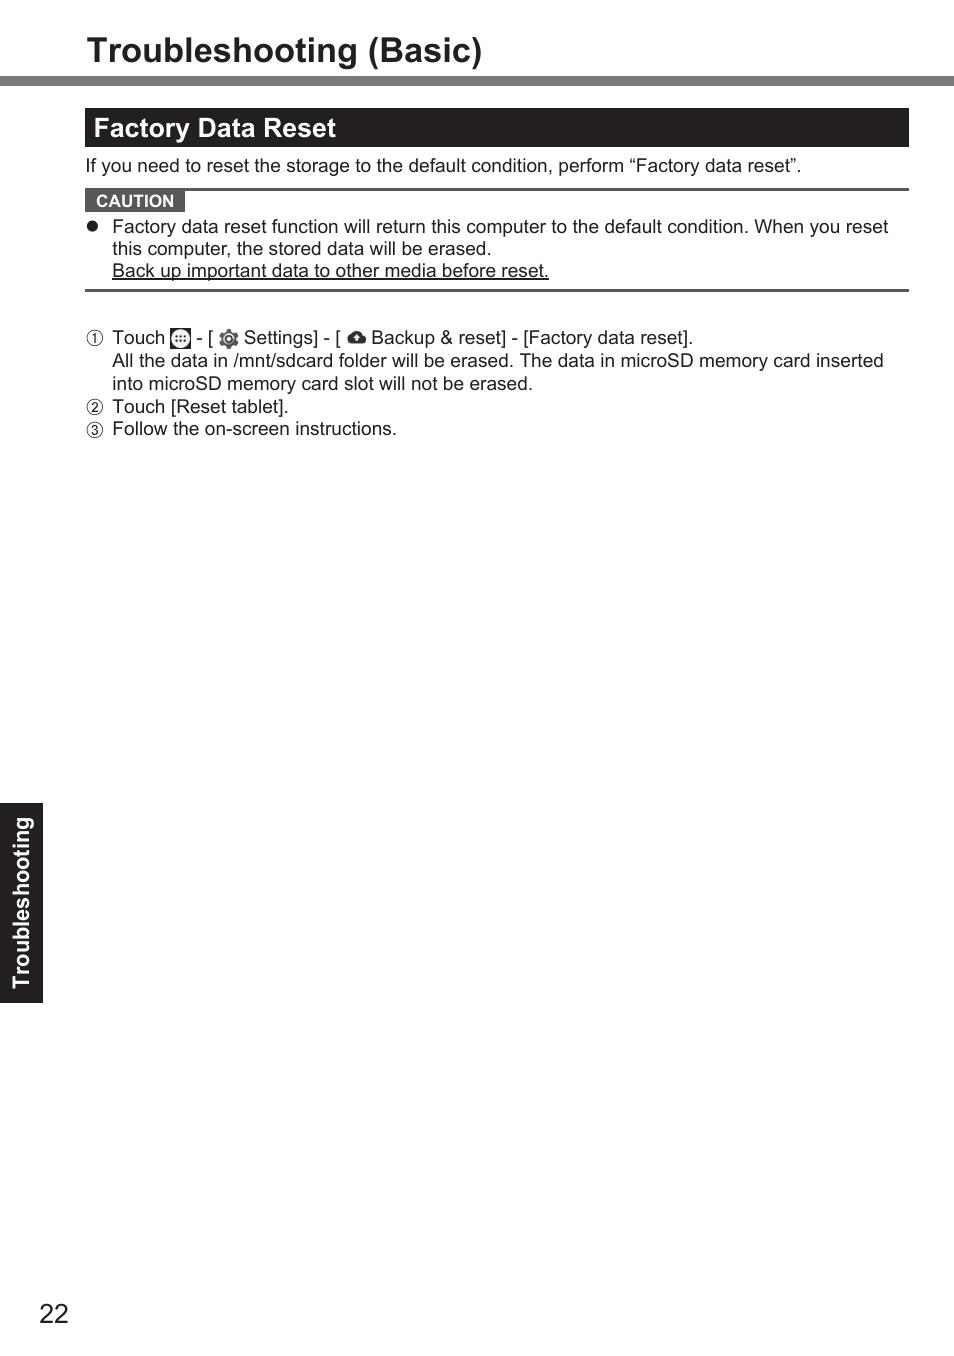 Troubleshooting (basic), Factory data reset | Panasonic Toughpad FZ